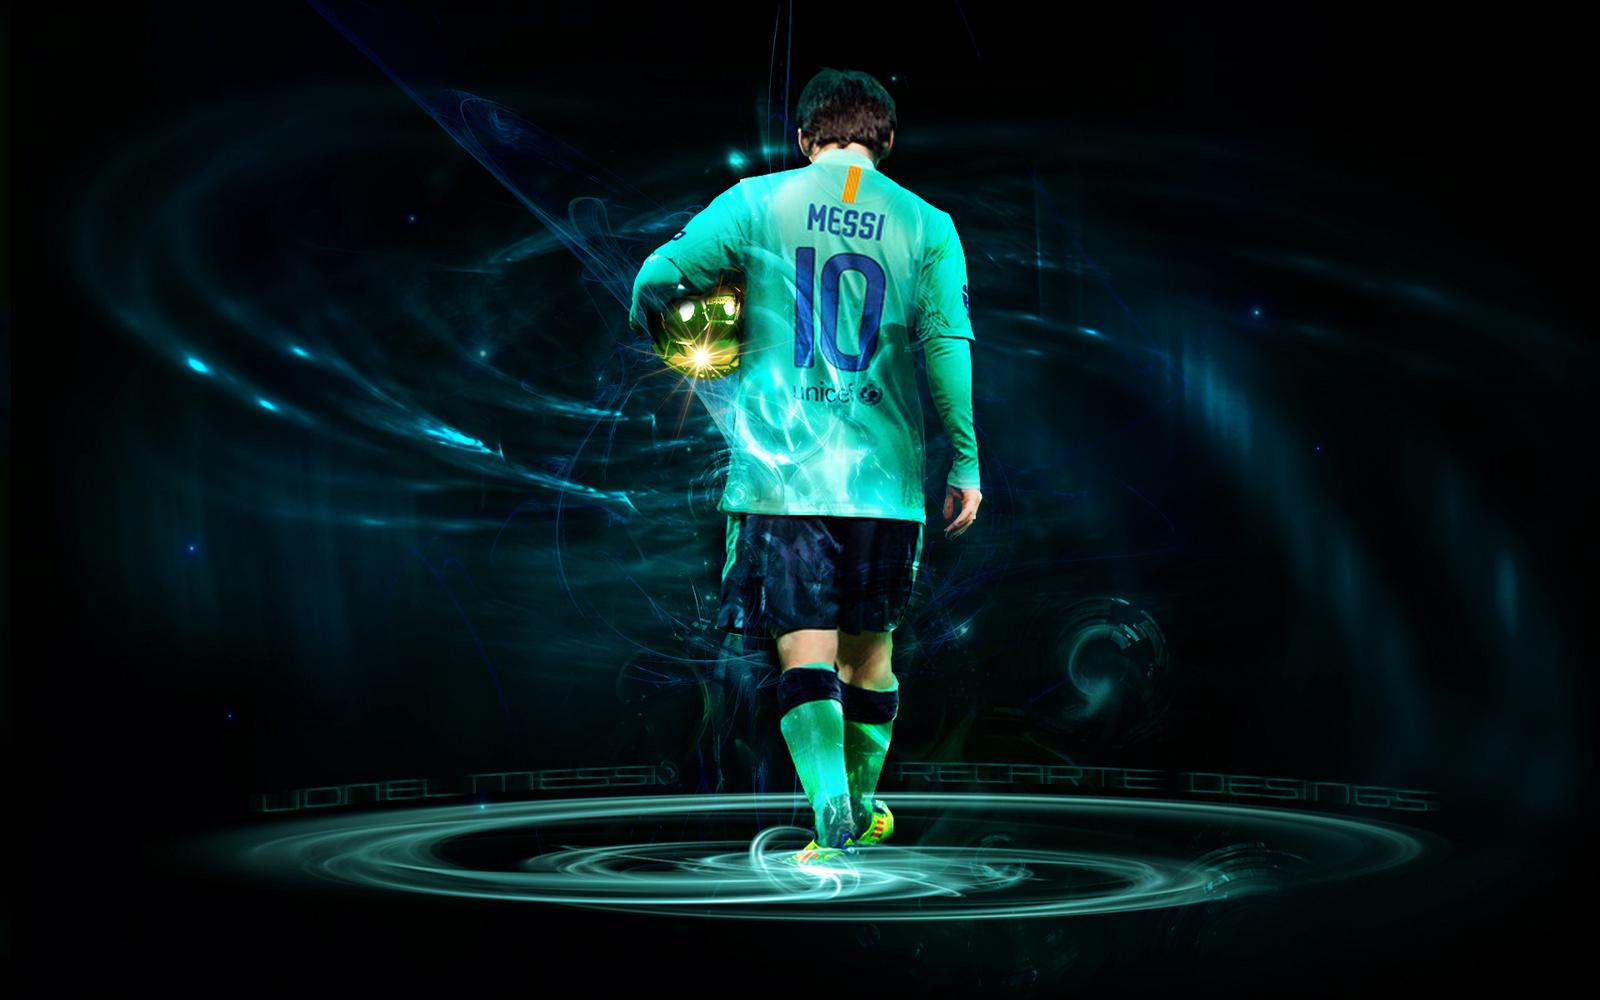 Lionel Messi Logo Wallpaper HD Wallpaper WallpaperLepi 1600x1000